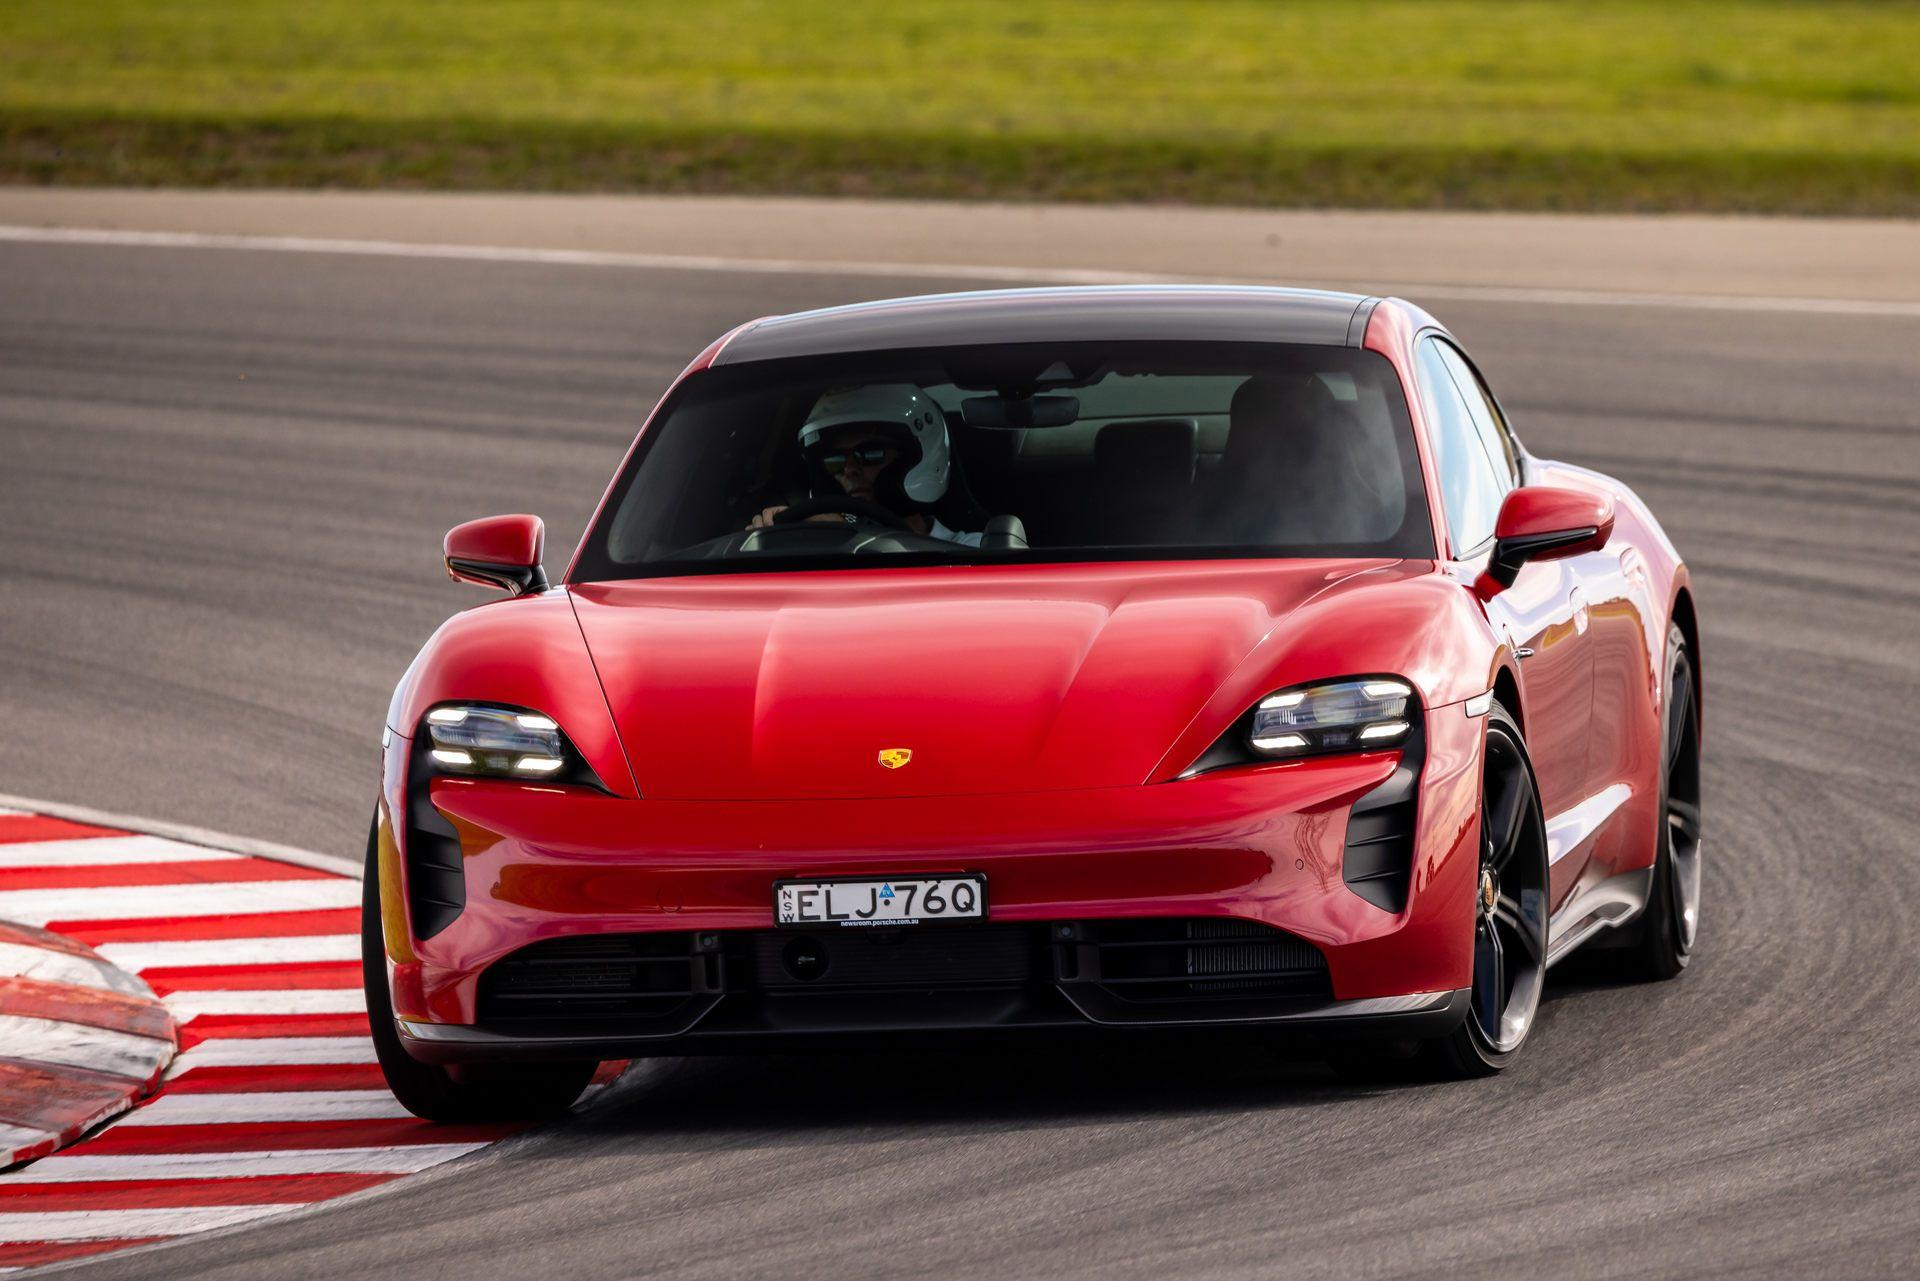 Porsche-Taycan-Turbo-S-The-Bend-Motorsport-Park-5